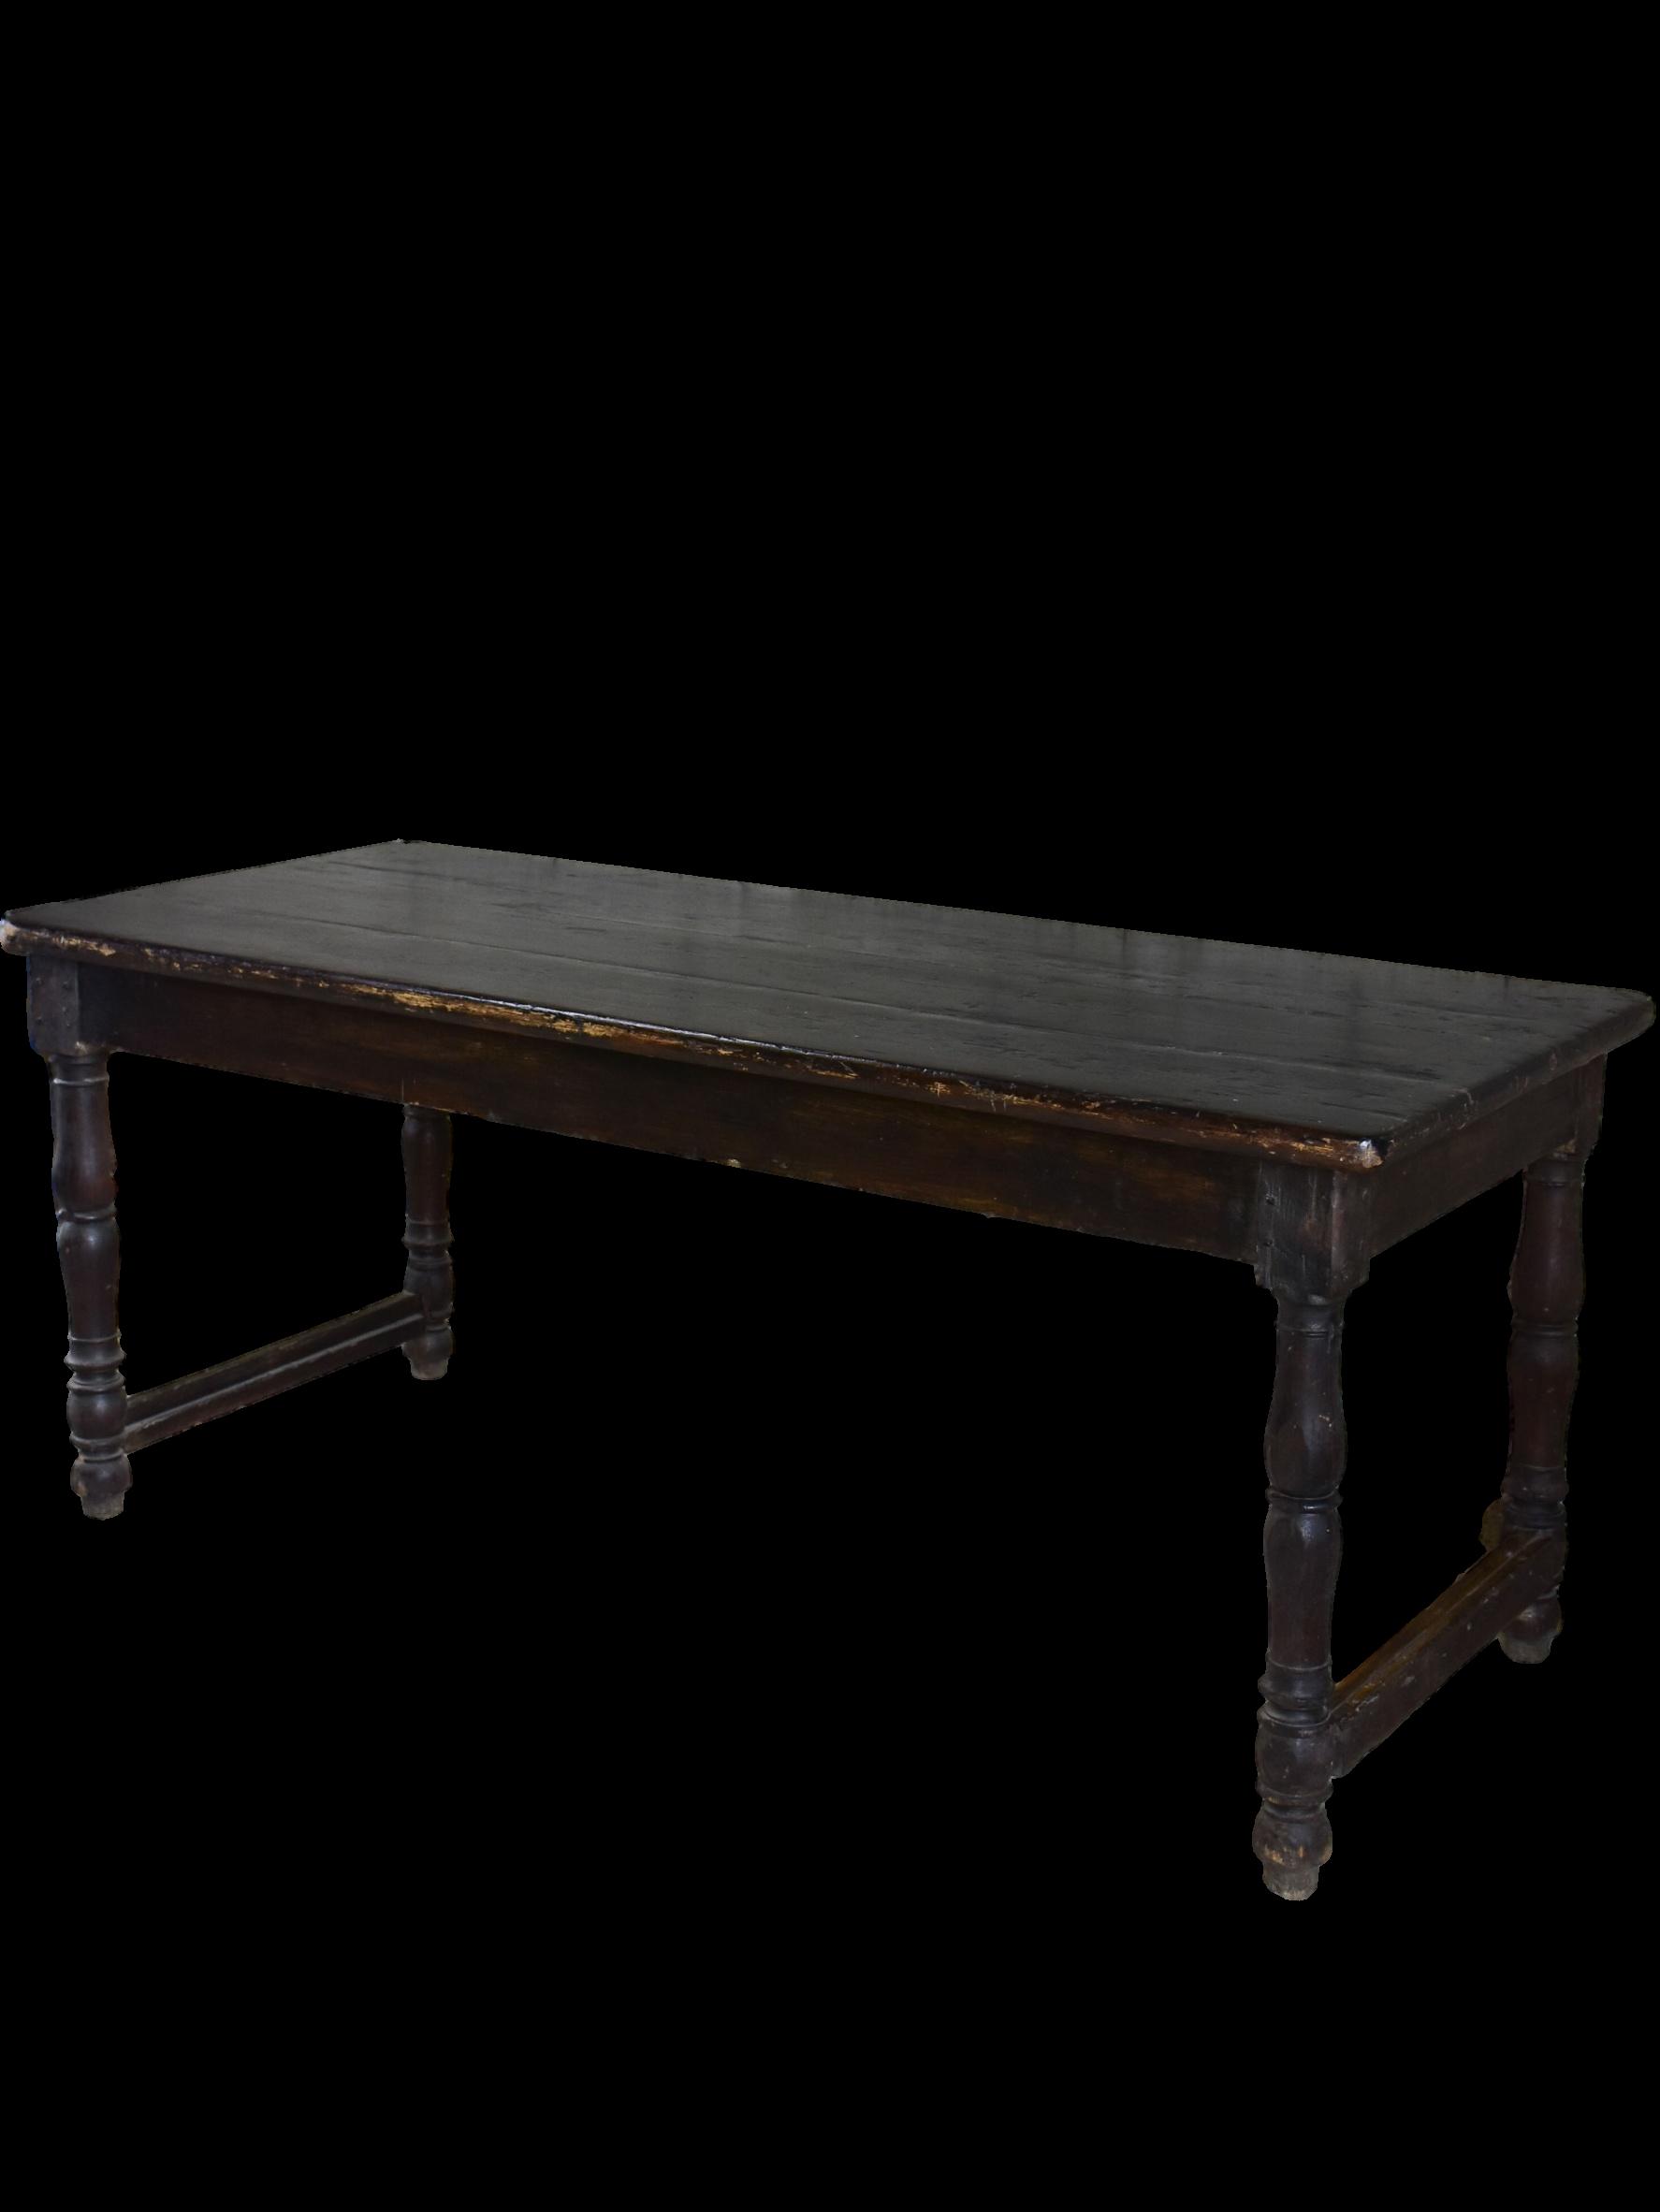 Groovy Antique Italian Console Dining Table Black Farmhouse Theyellowbook Wood Chair Design Ideas Theyellowbookinfo